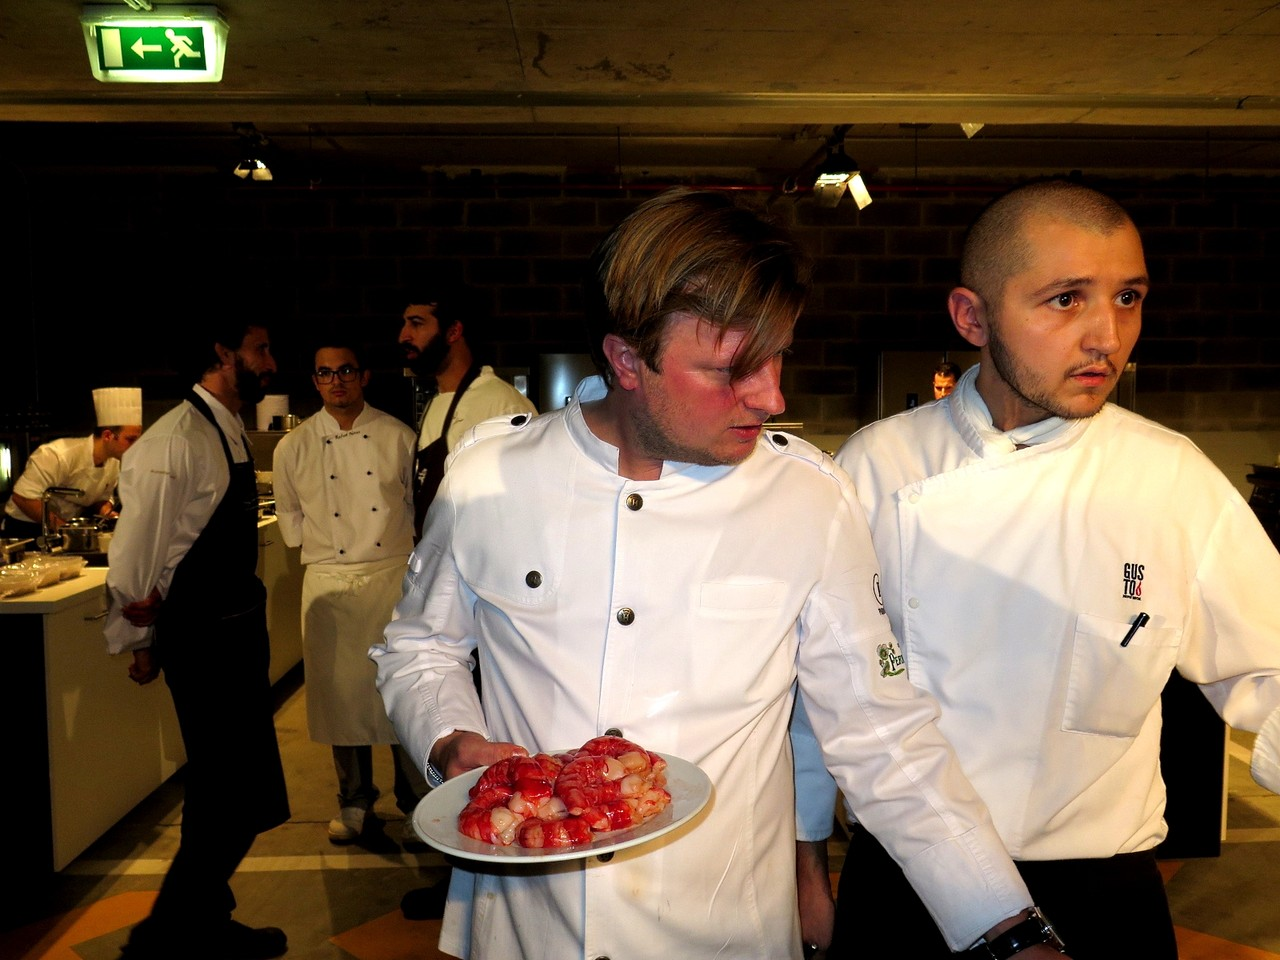 Kevin Fehling e Daniele Pirillo, chef residente do GUSTO by Heinz Beck